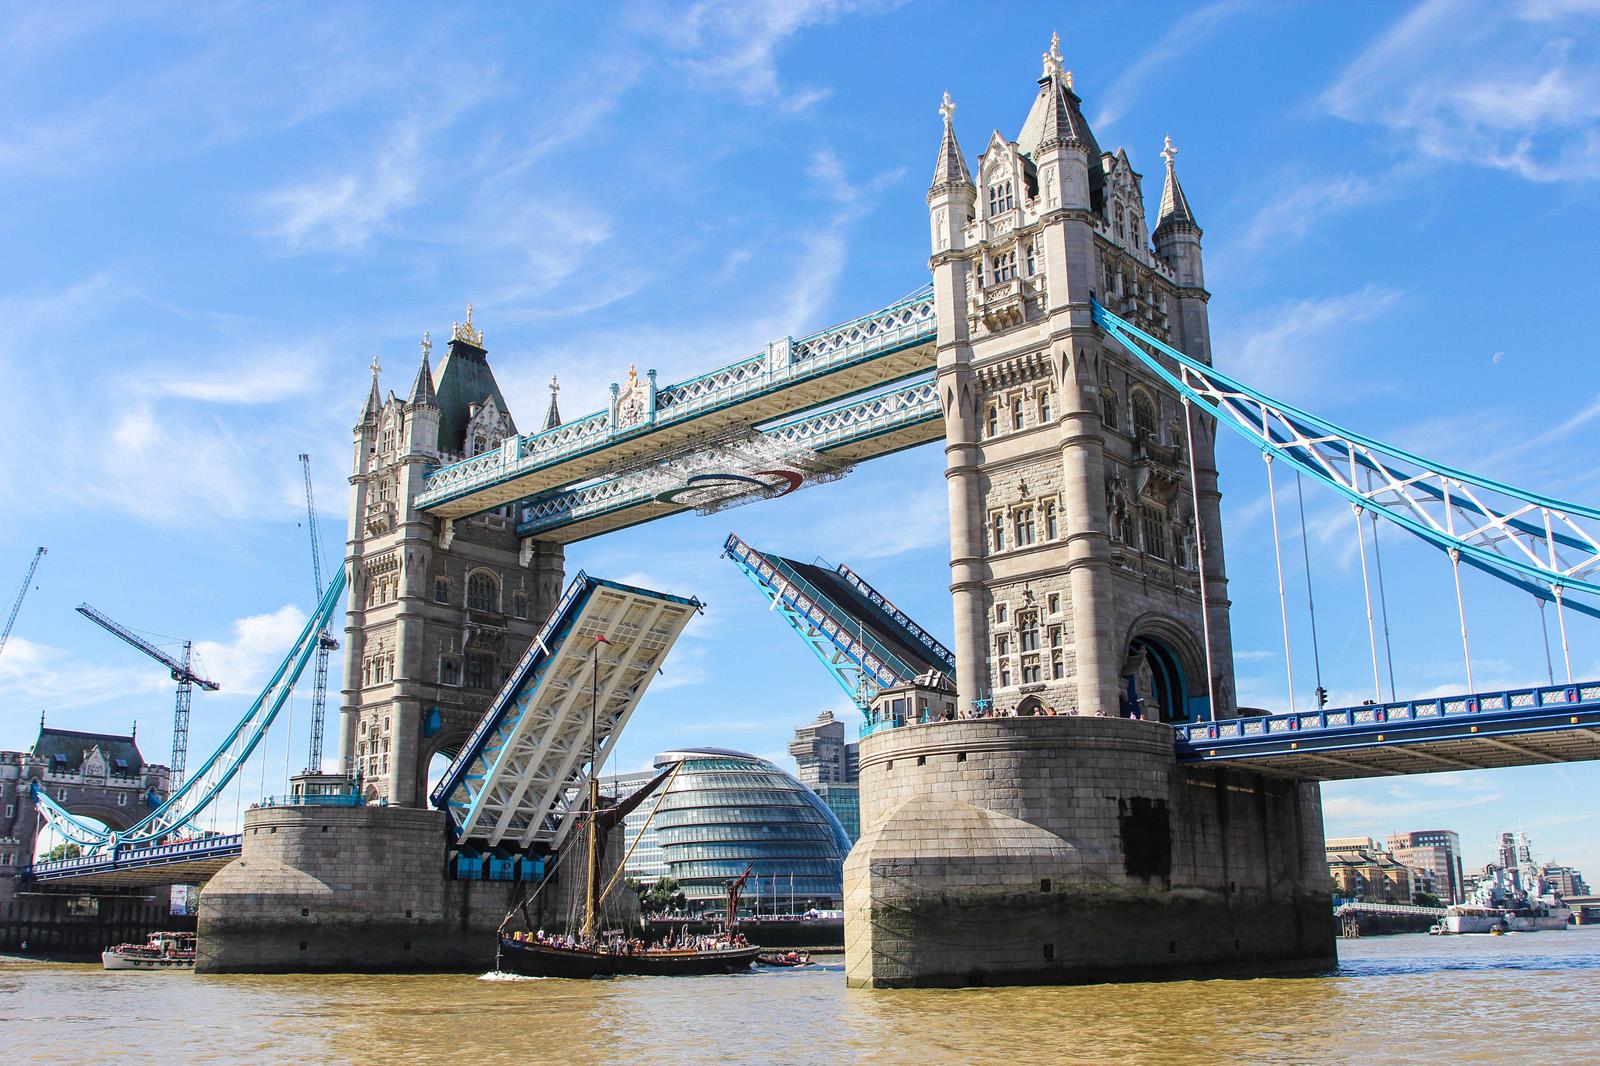 Tower Bridge. London. England